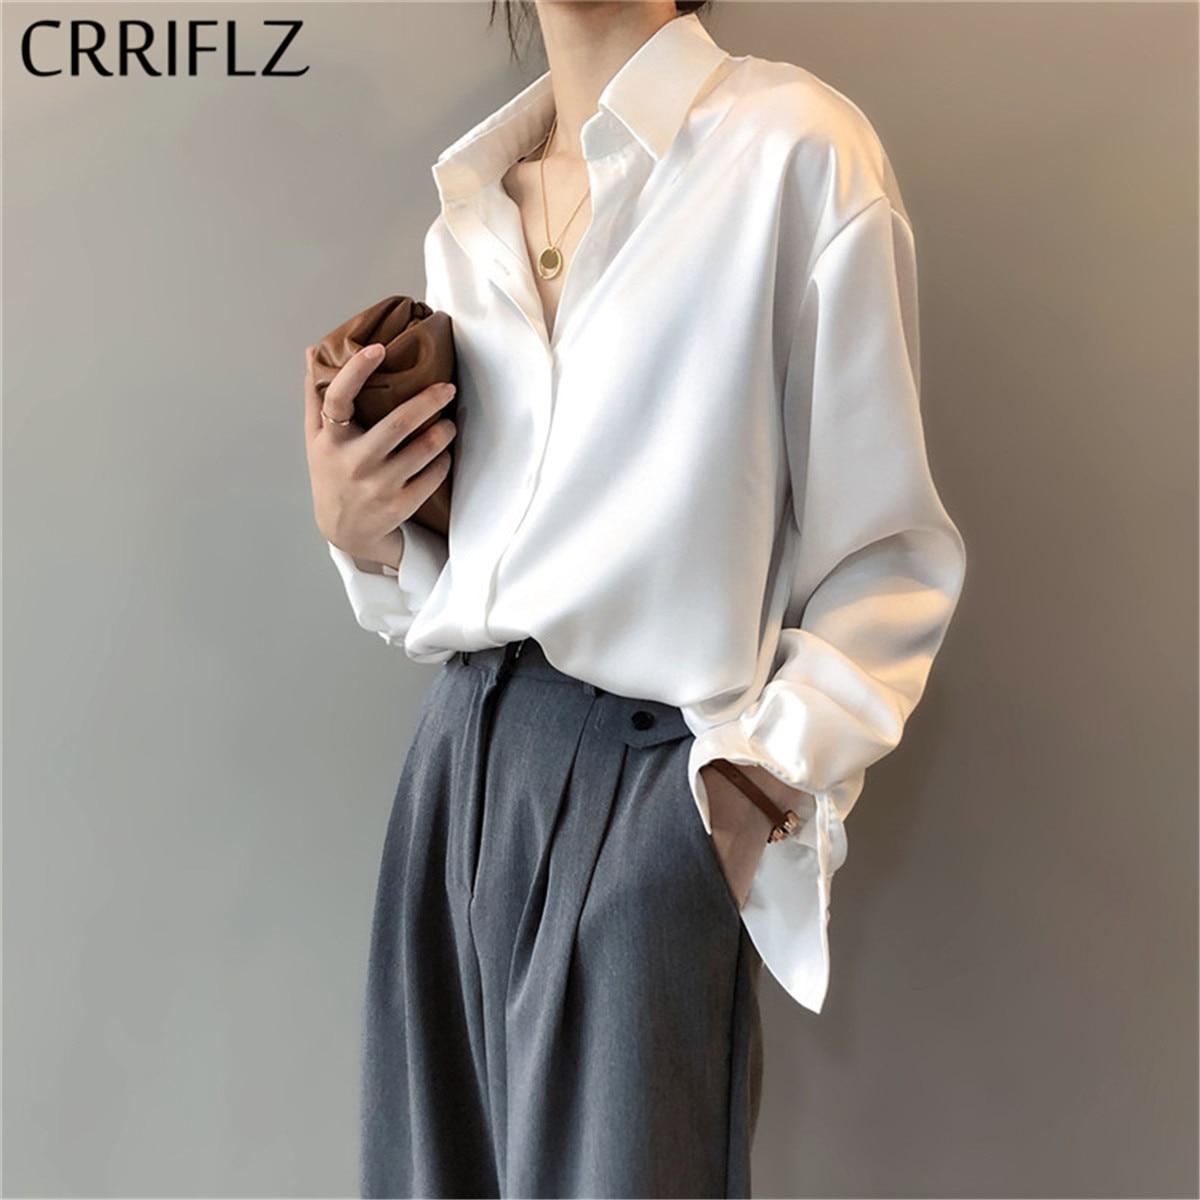 CRRIFLZ 2020 New Spring Women Fashion Long Sleeves Satin Blouse Vintage Femme V Neck Street Shirts Elegant Imitation Silk Blouse